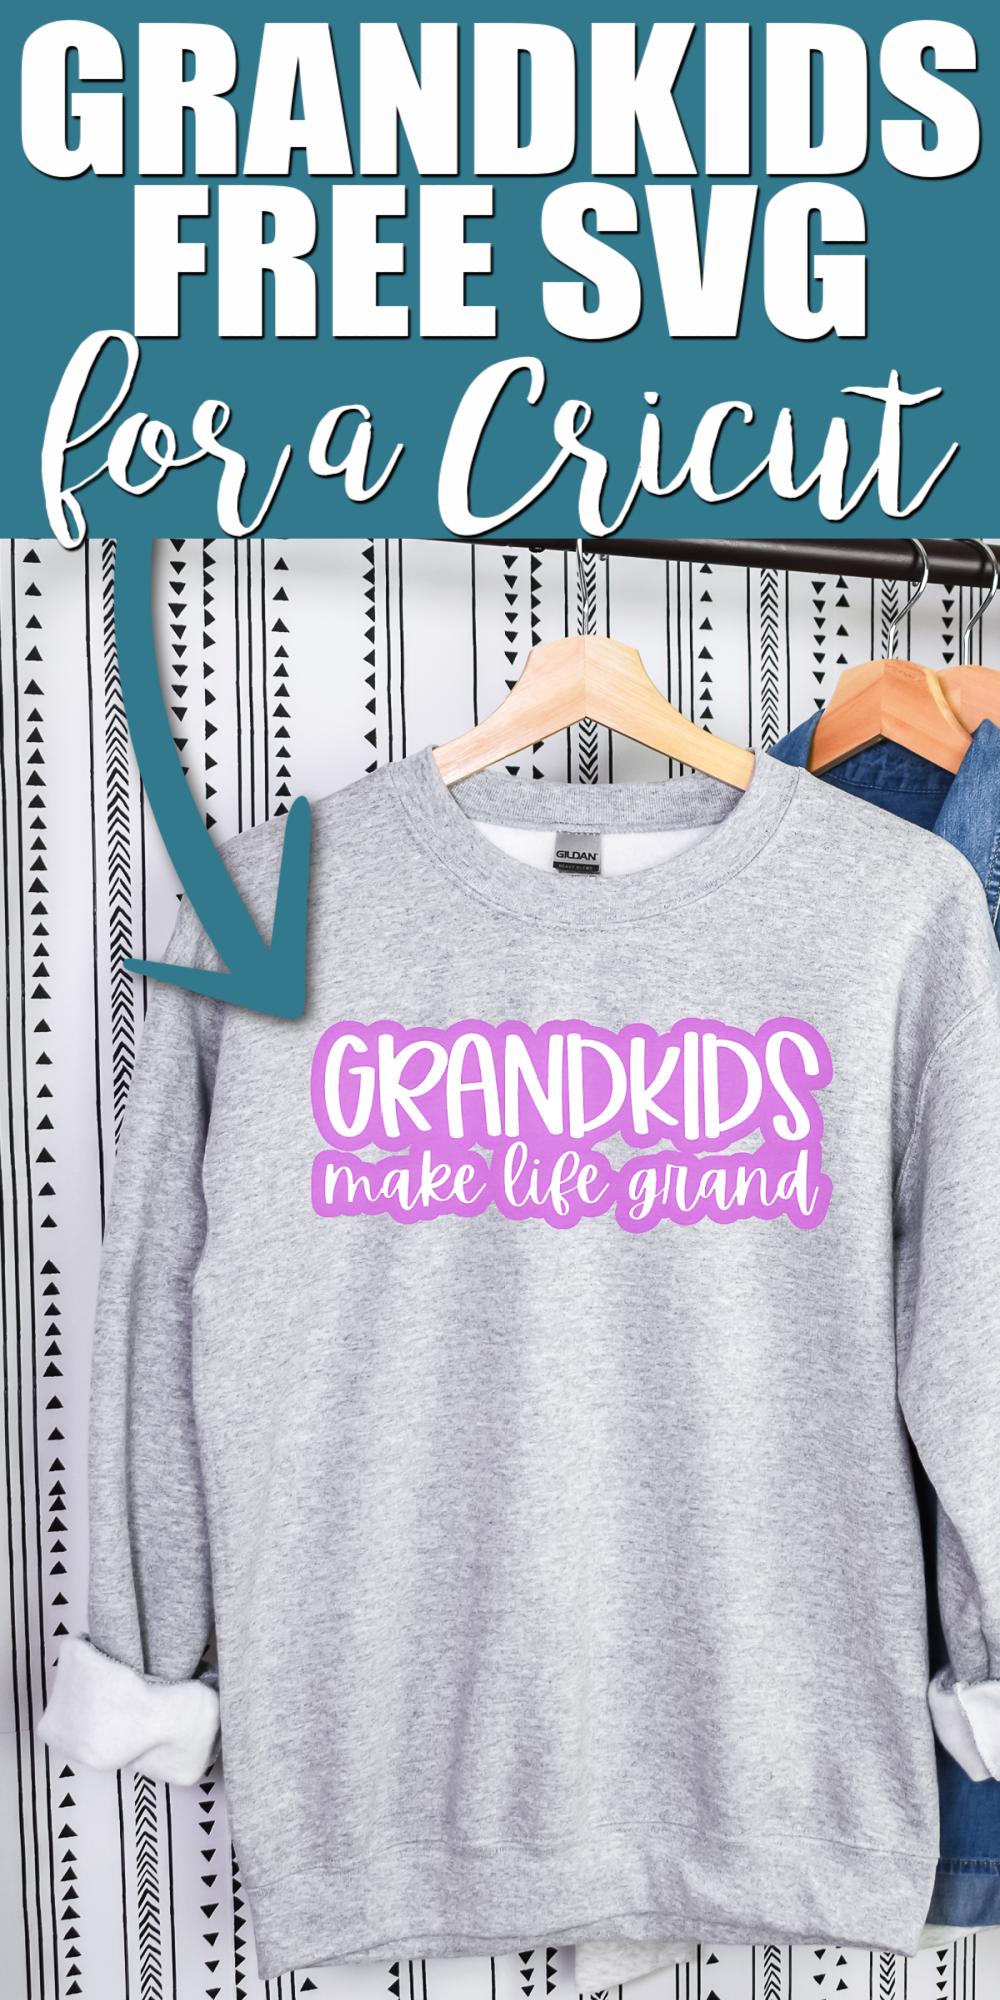 grandkids free svg file